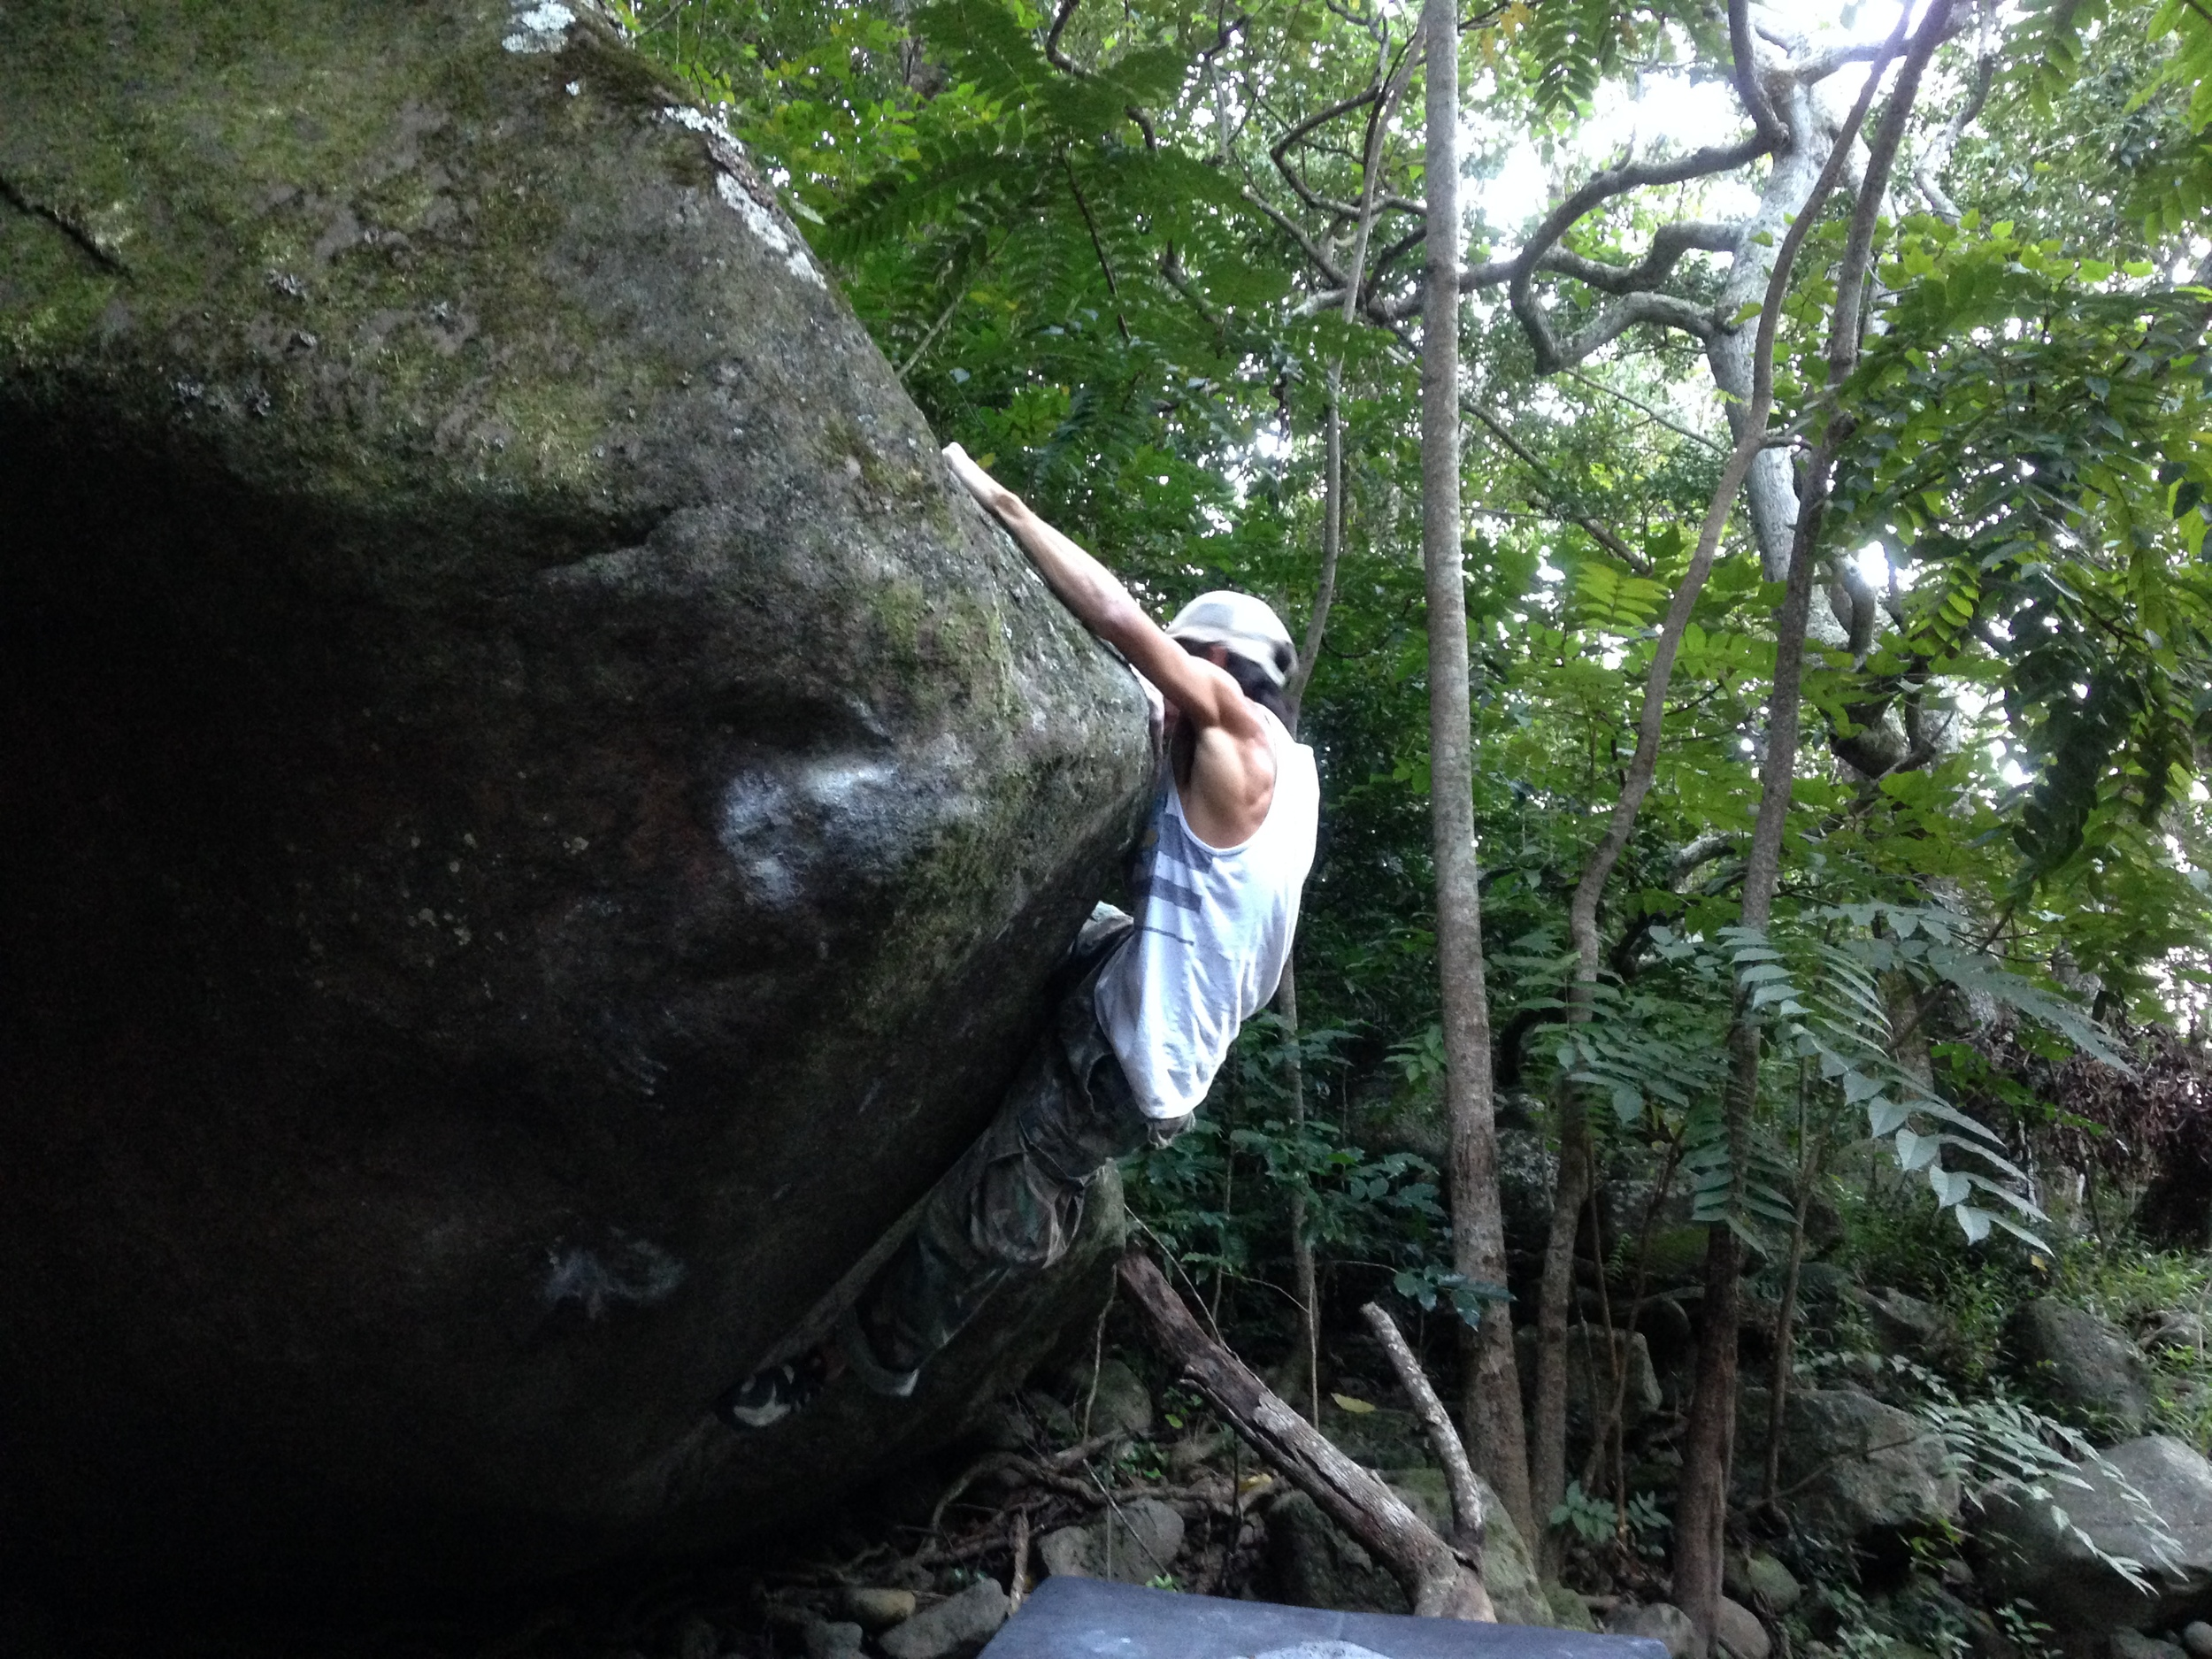 Chase reaching enlightenment. PC: Matt Lutey